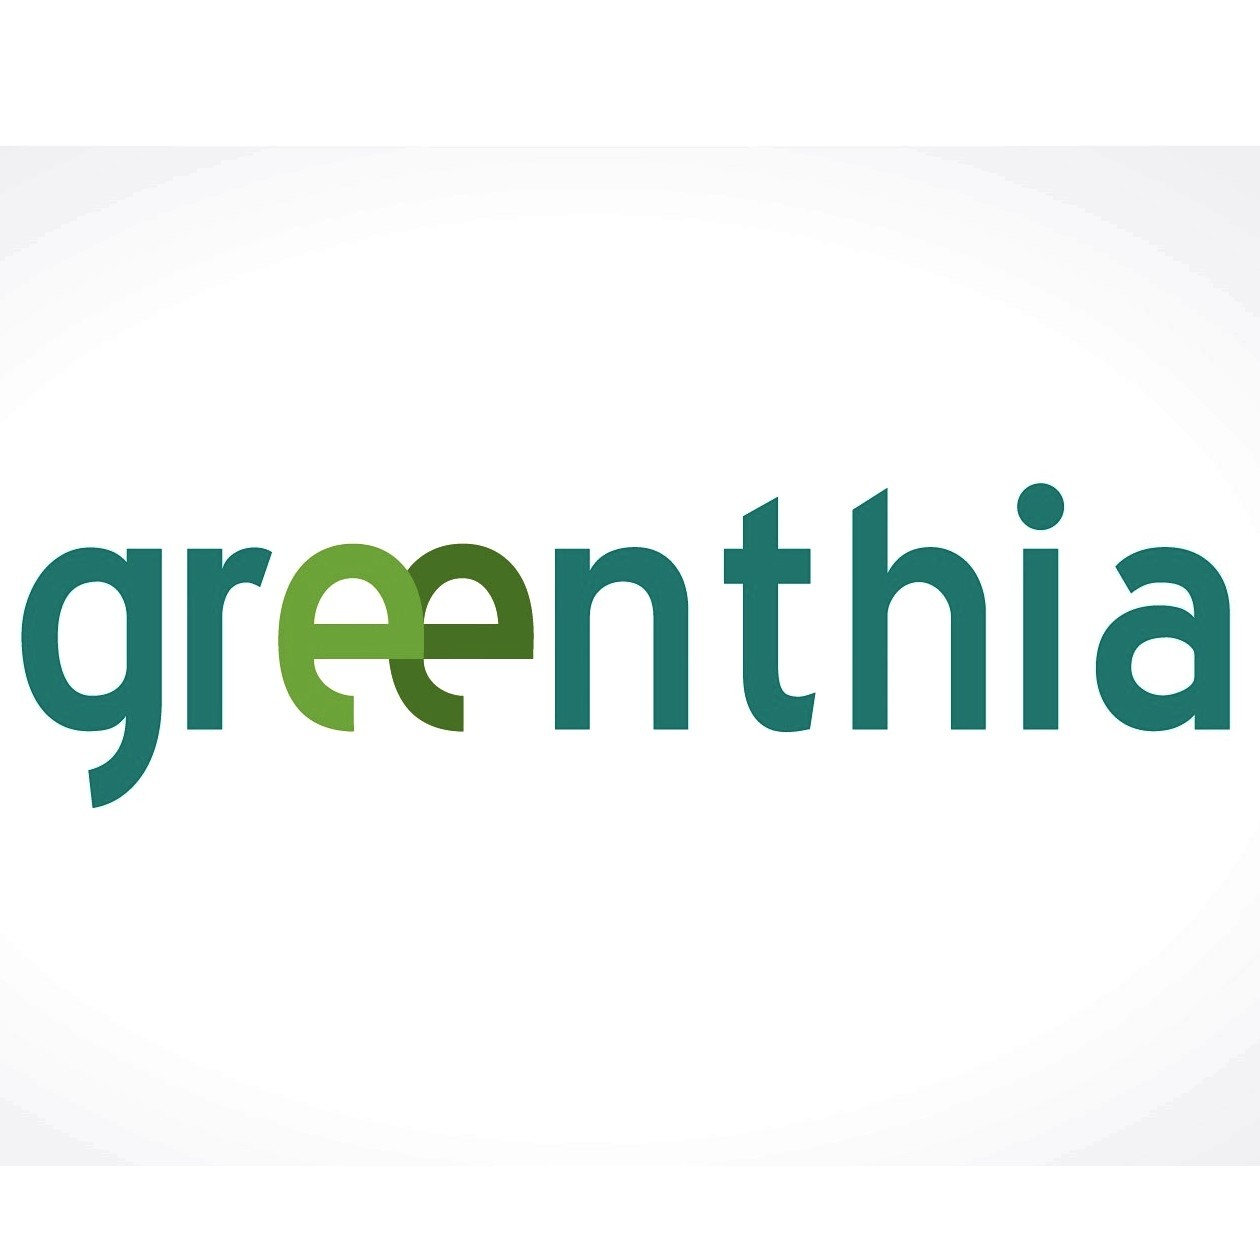 Greenthia Servicios Integrales